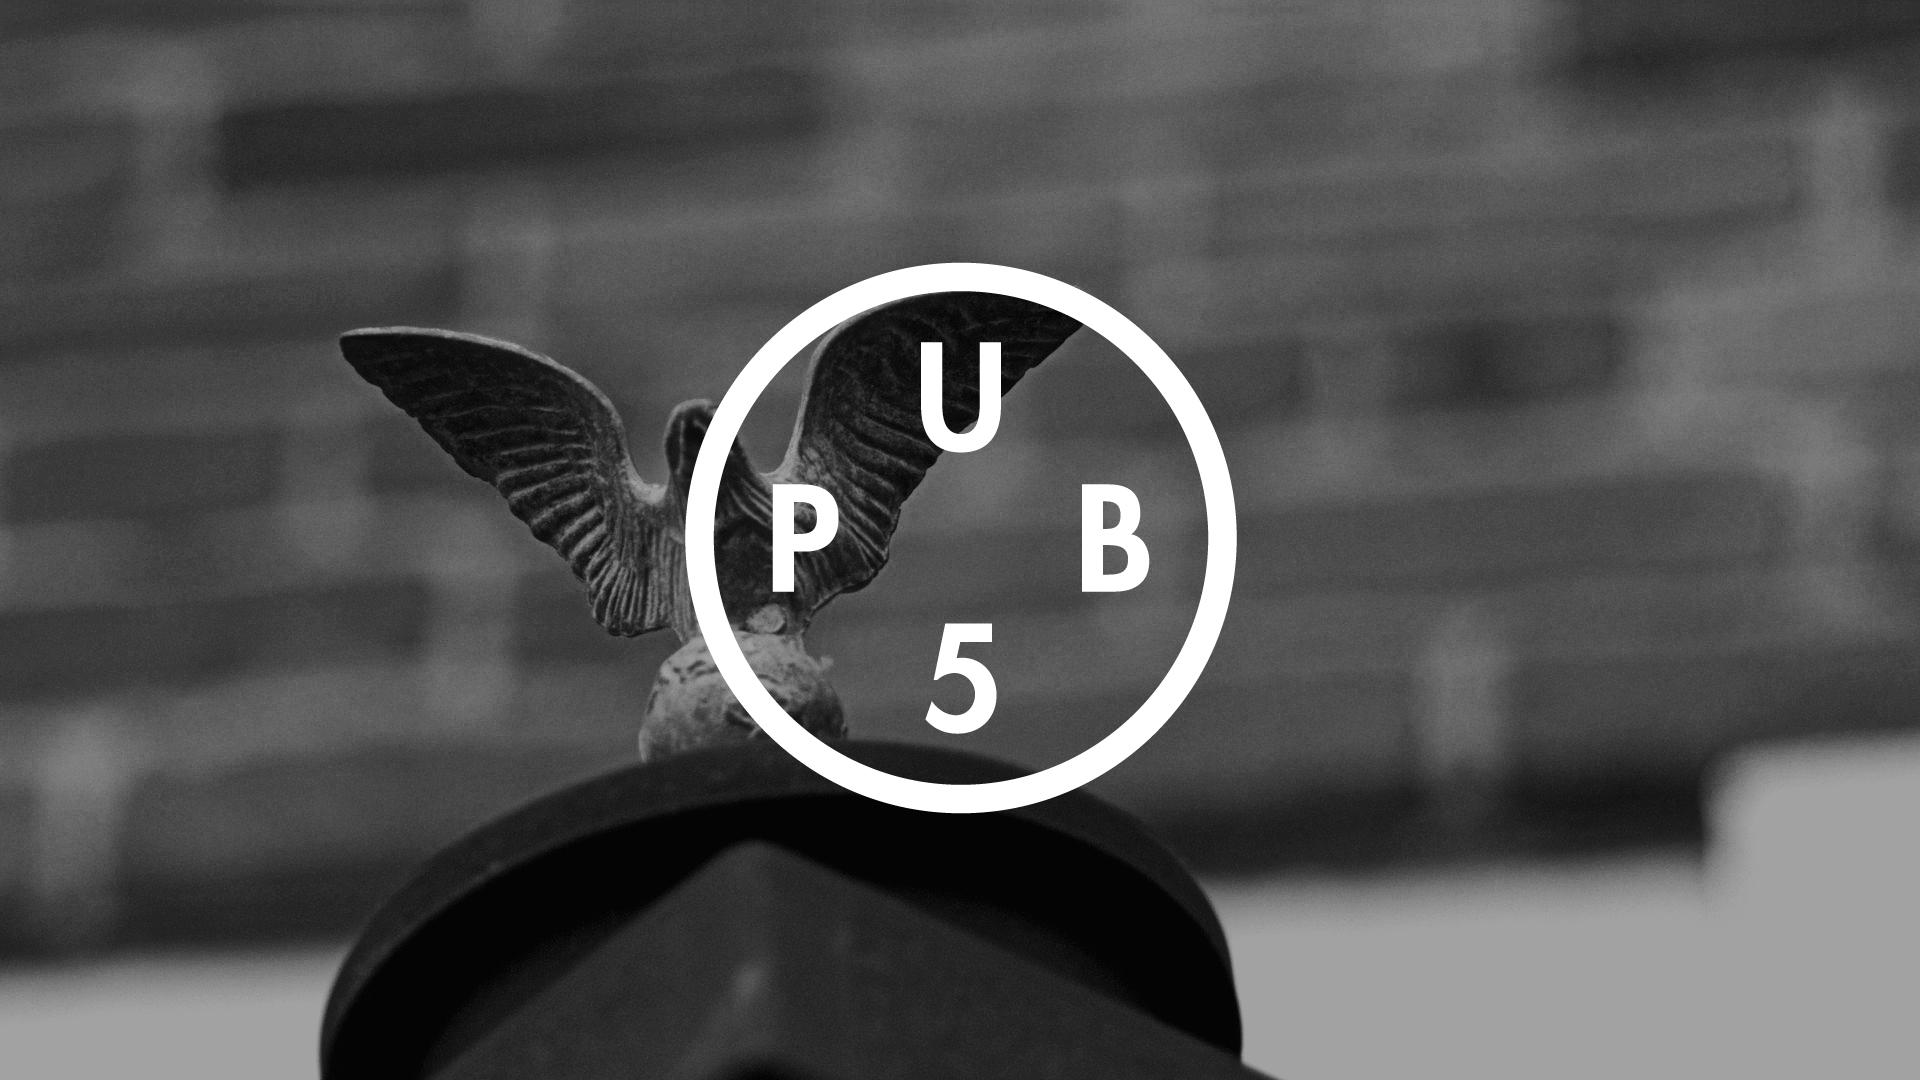 Pub5_Title_01.jpg